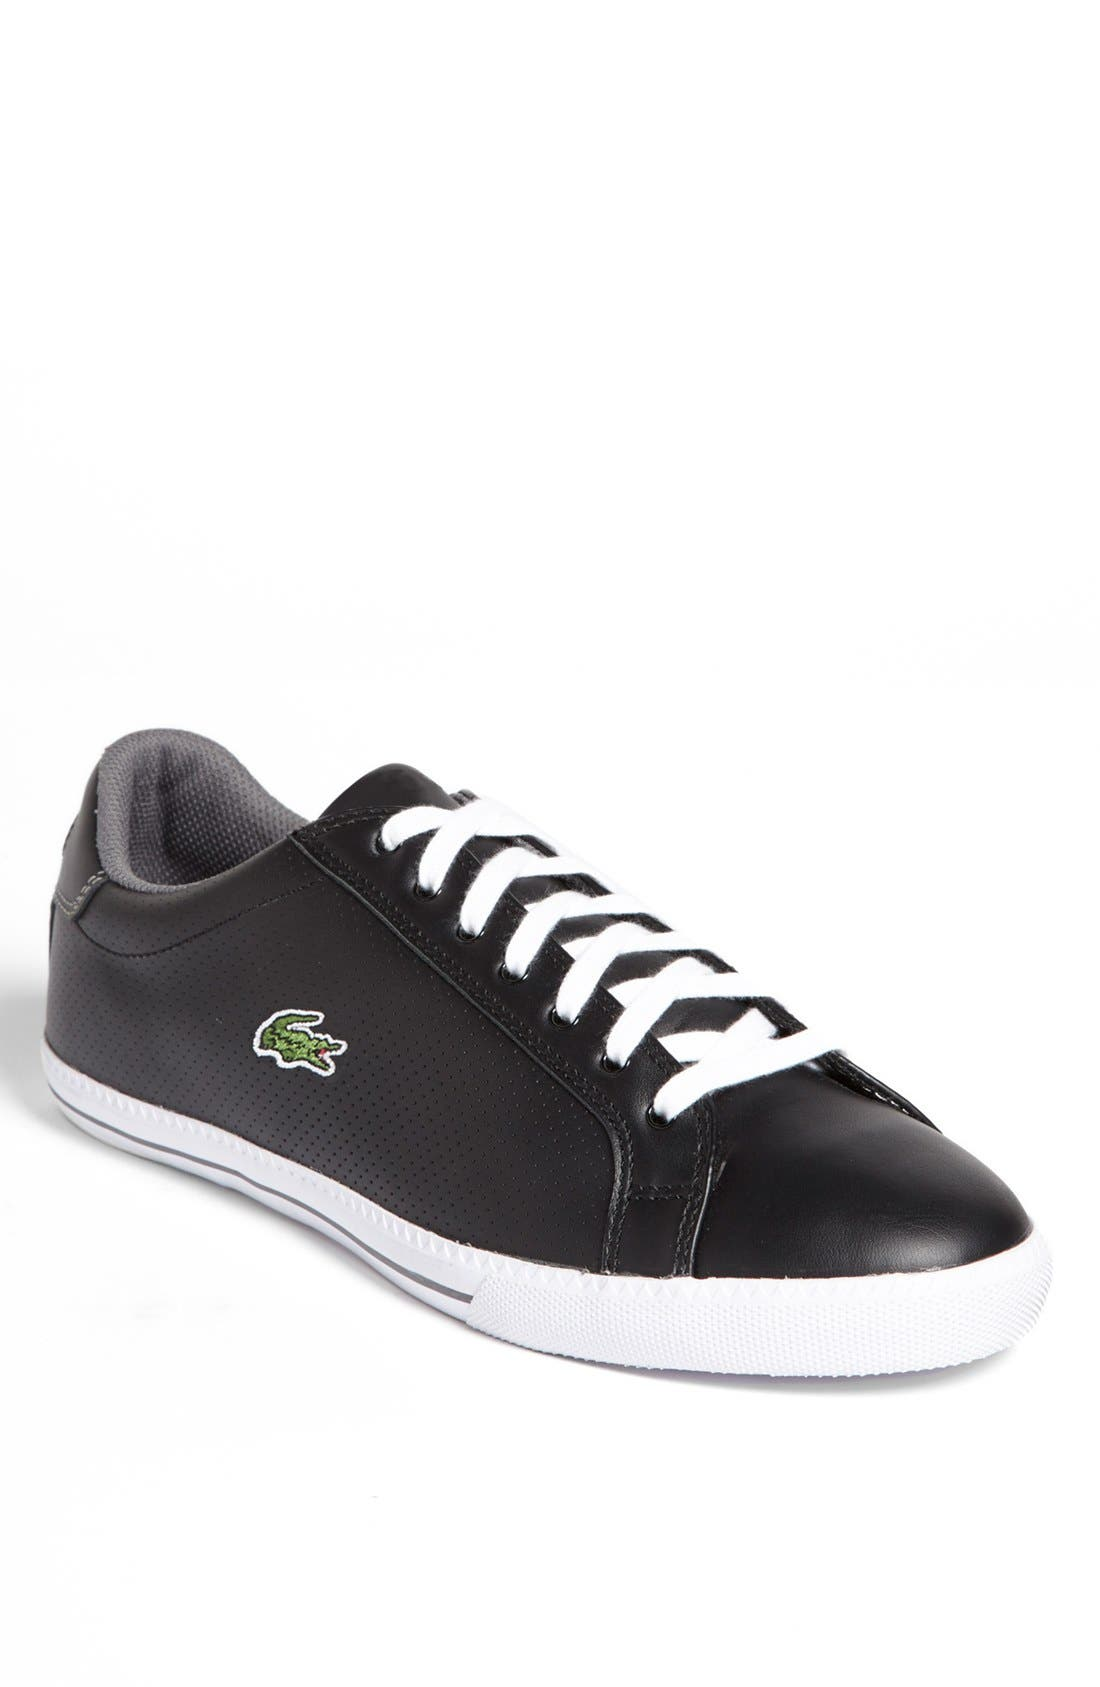 'Graduate' Sneaker,                             Main thumbnail 1, color,                             002